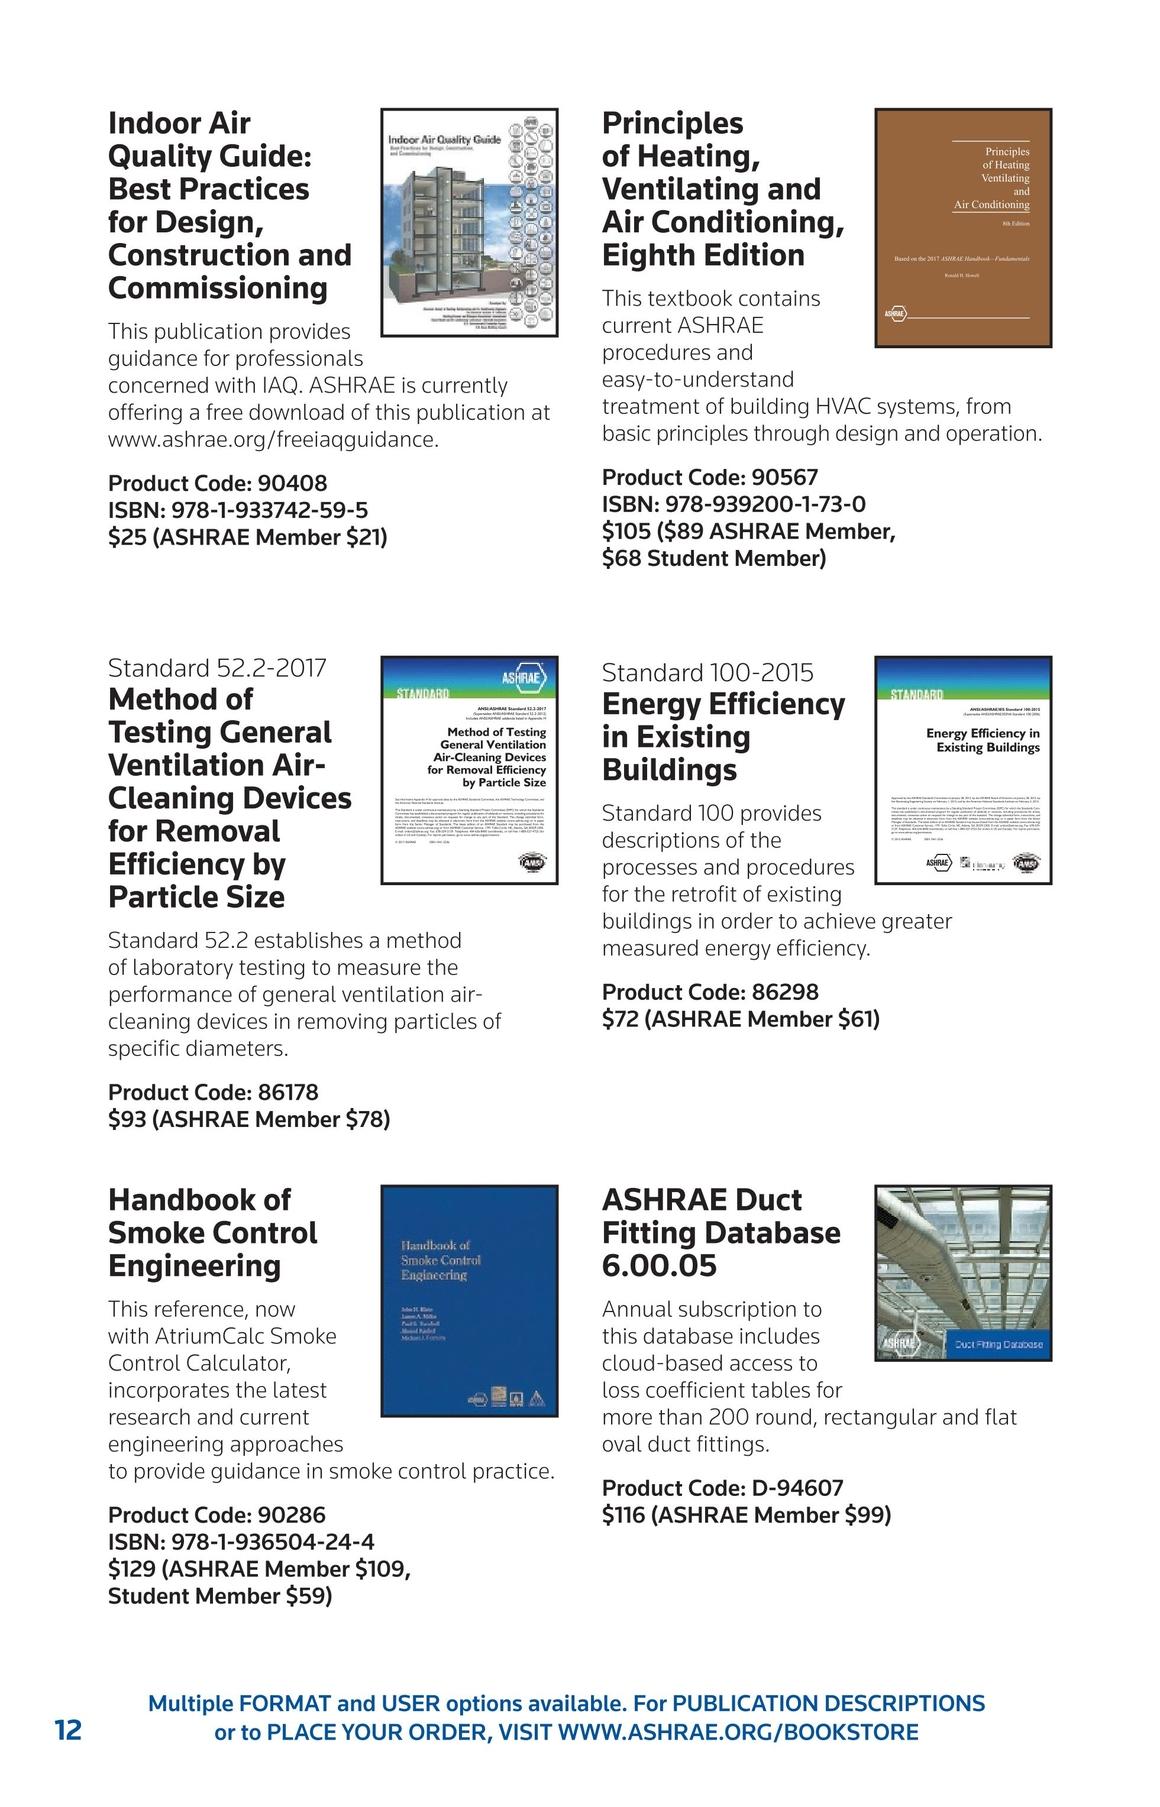 ASHRAE Publications Catalog - Summer 2017